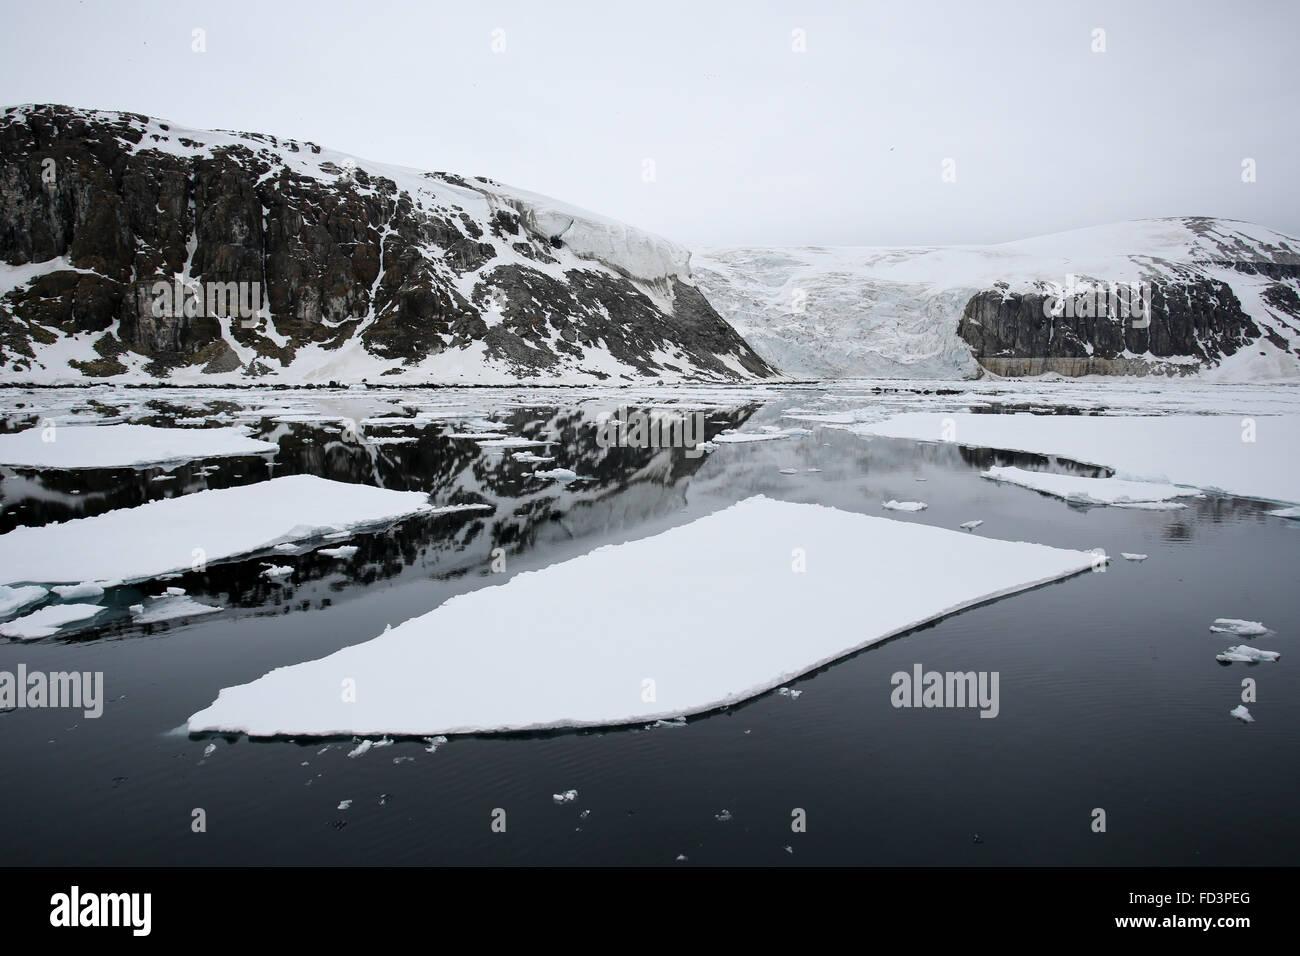 Svalbard, Spitsbergen, Alkefjellet. Glacier, snow covered cliffs and sea ice. - Stock Image